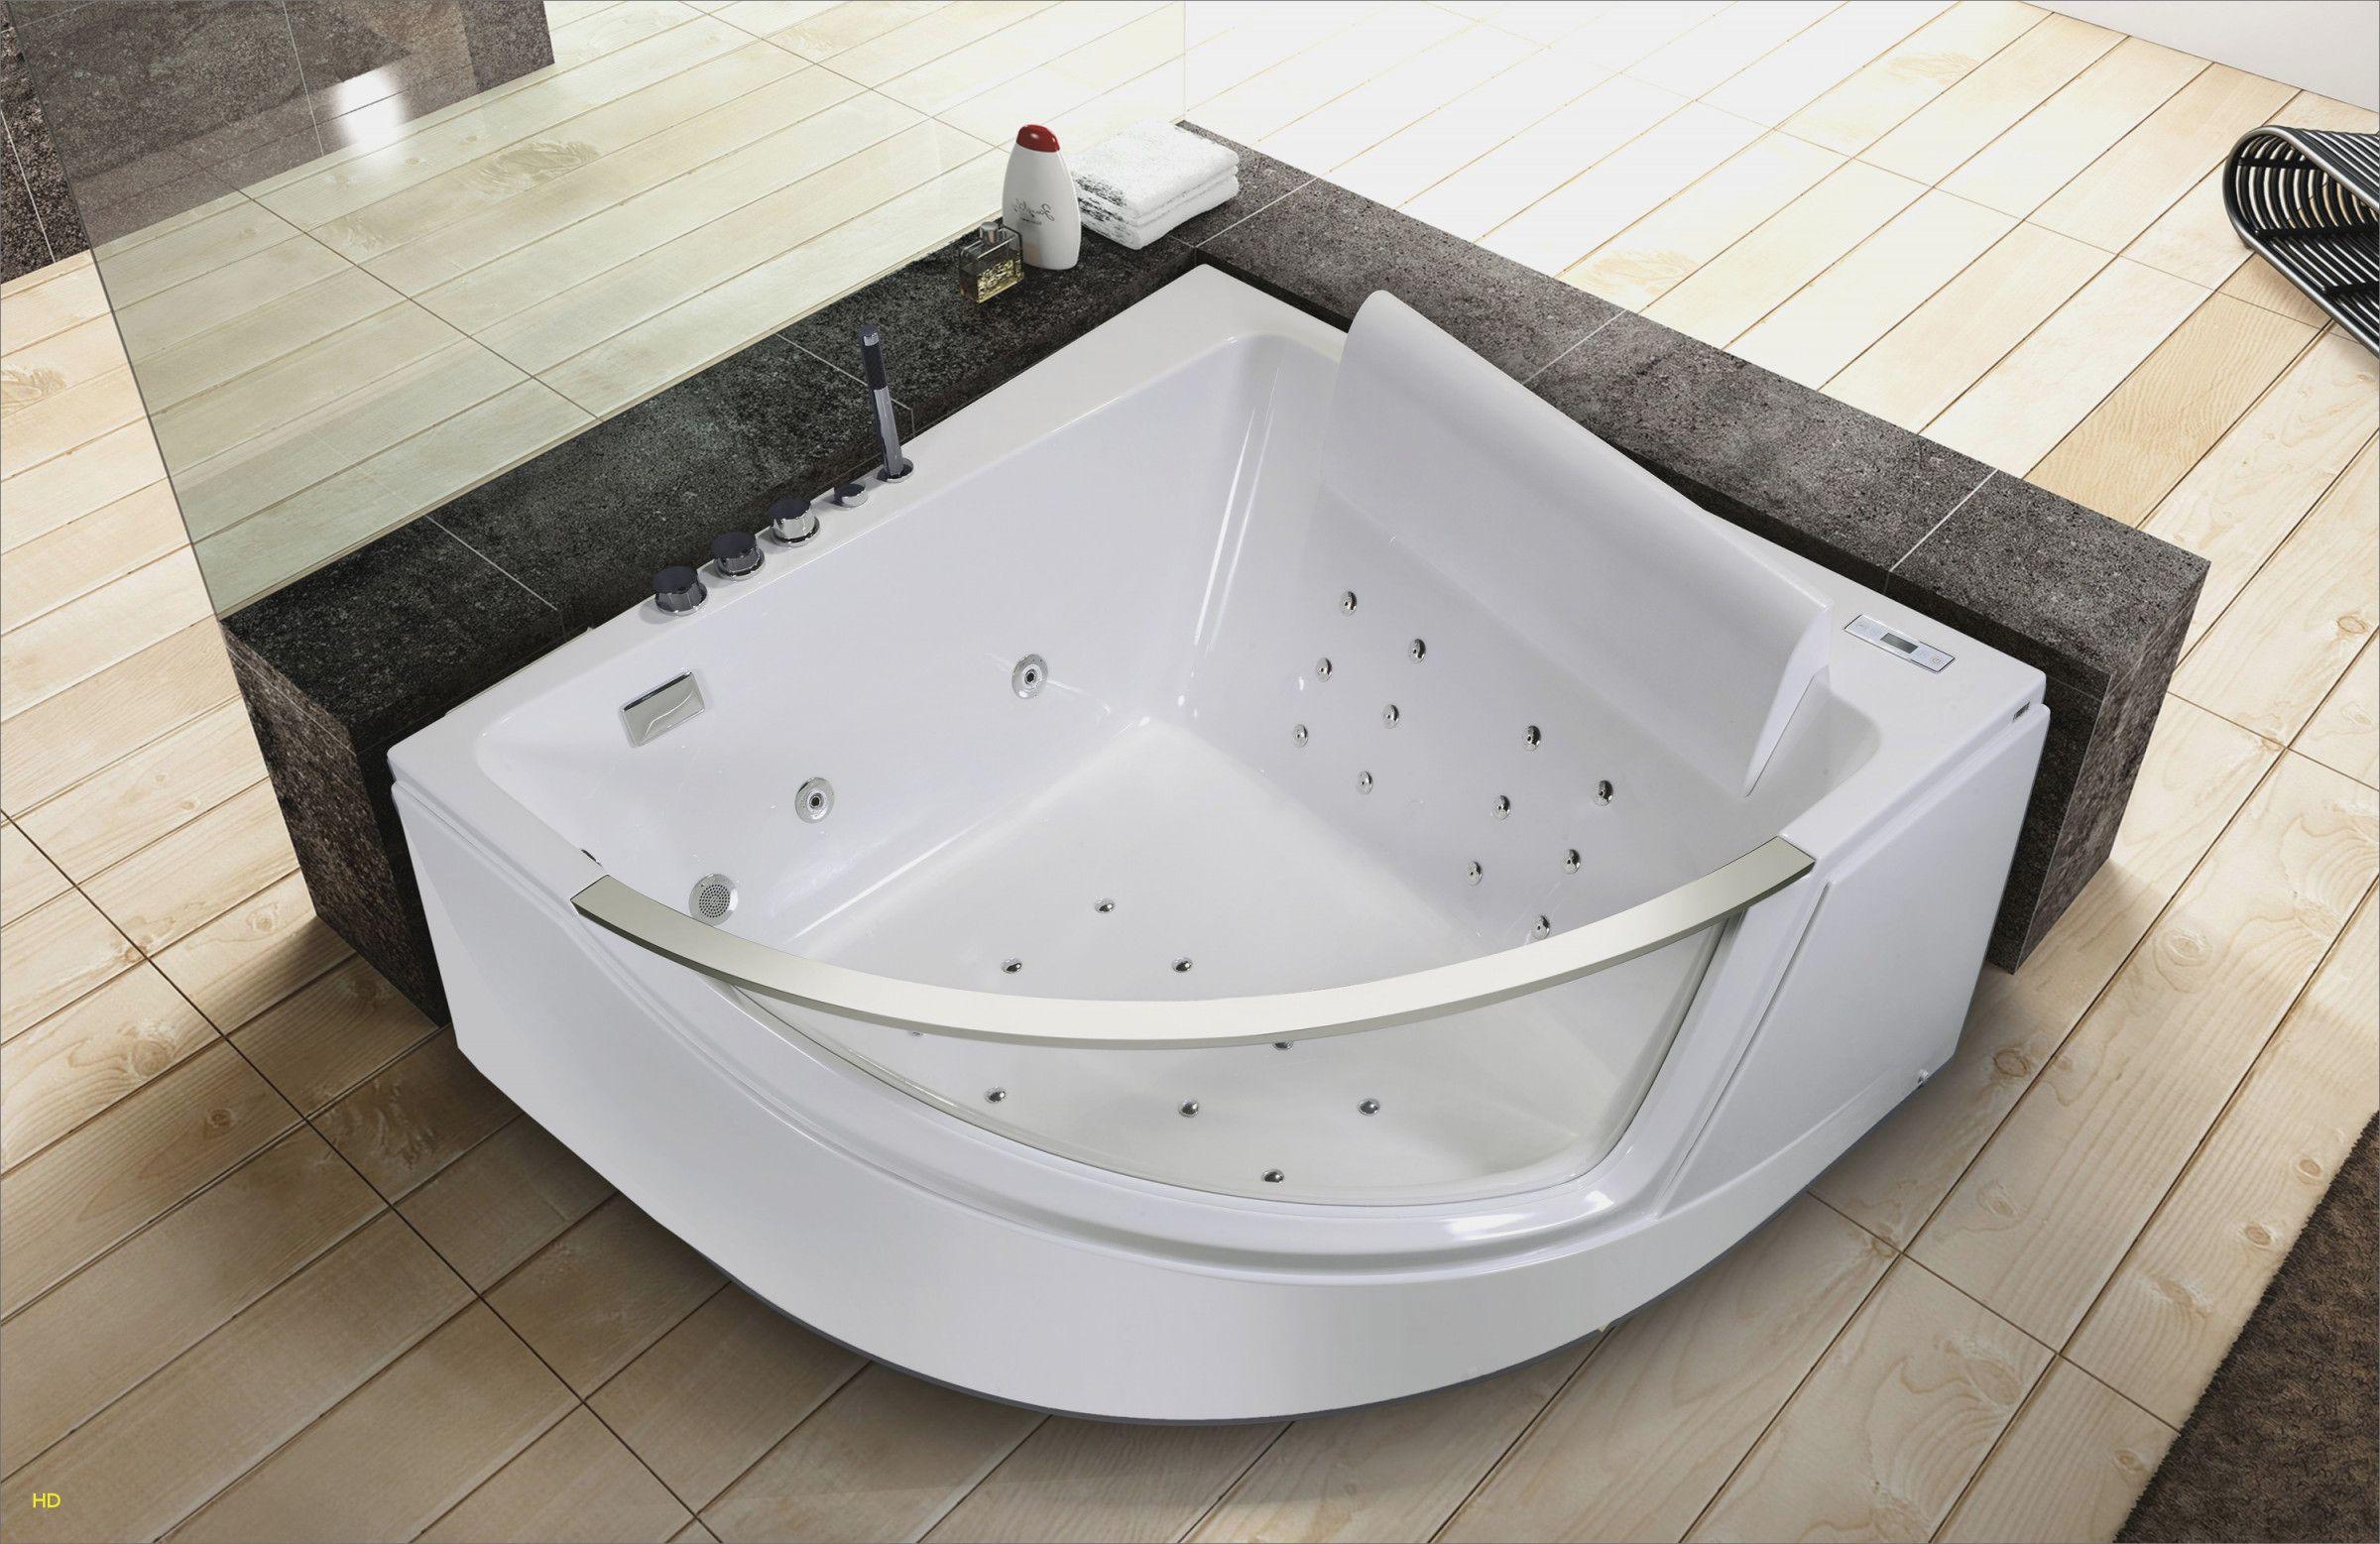 Baignoire D Angle Dimension Baignoire D Angle Dimension Baignoire Balneo D Angle Baignoires Balneos Pour Pose En L Diy Bathroom Decor Bathroom Decor Bathroom